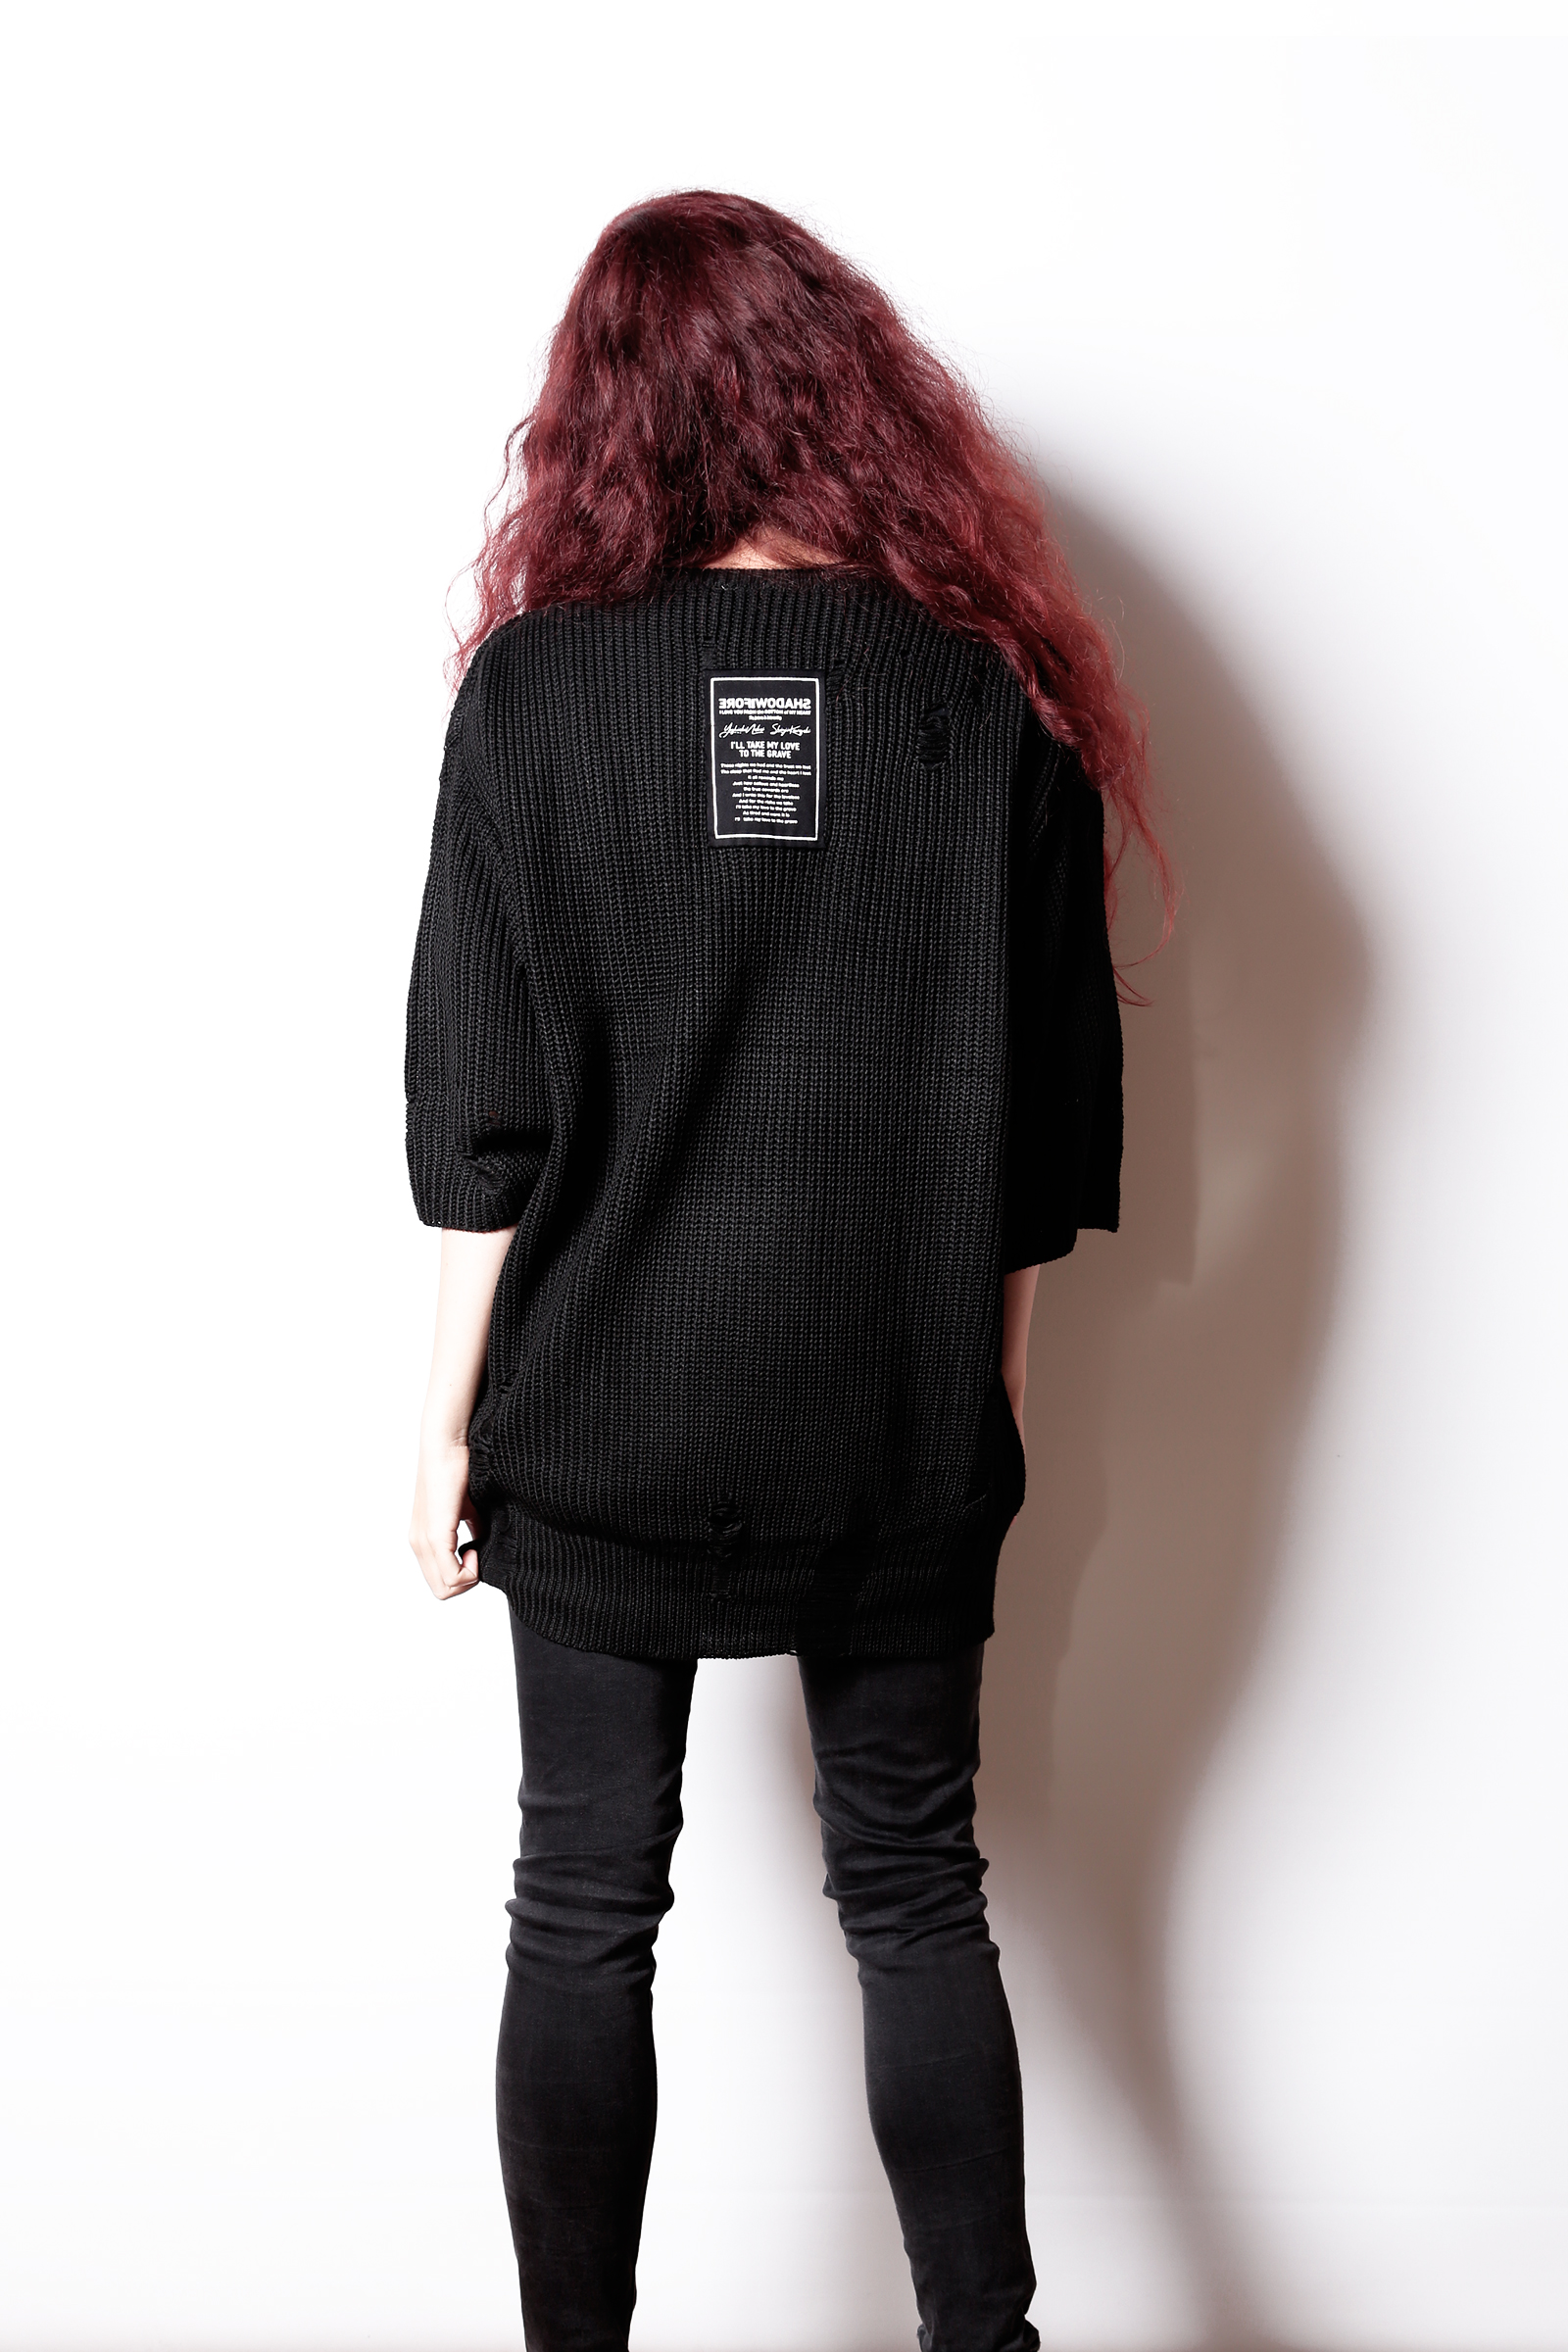 Knit_girl_back2